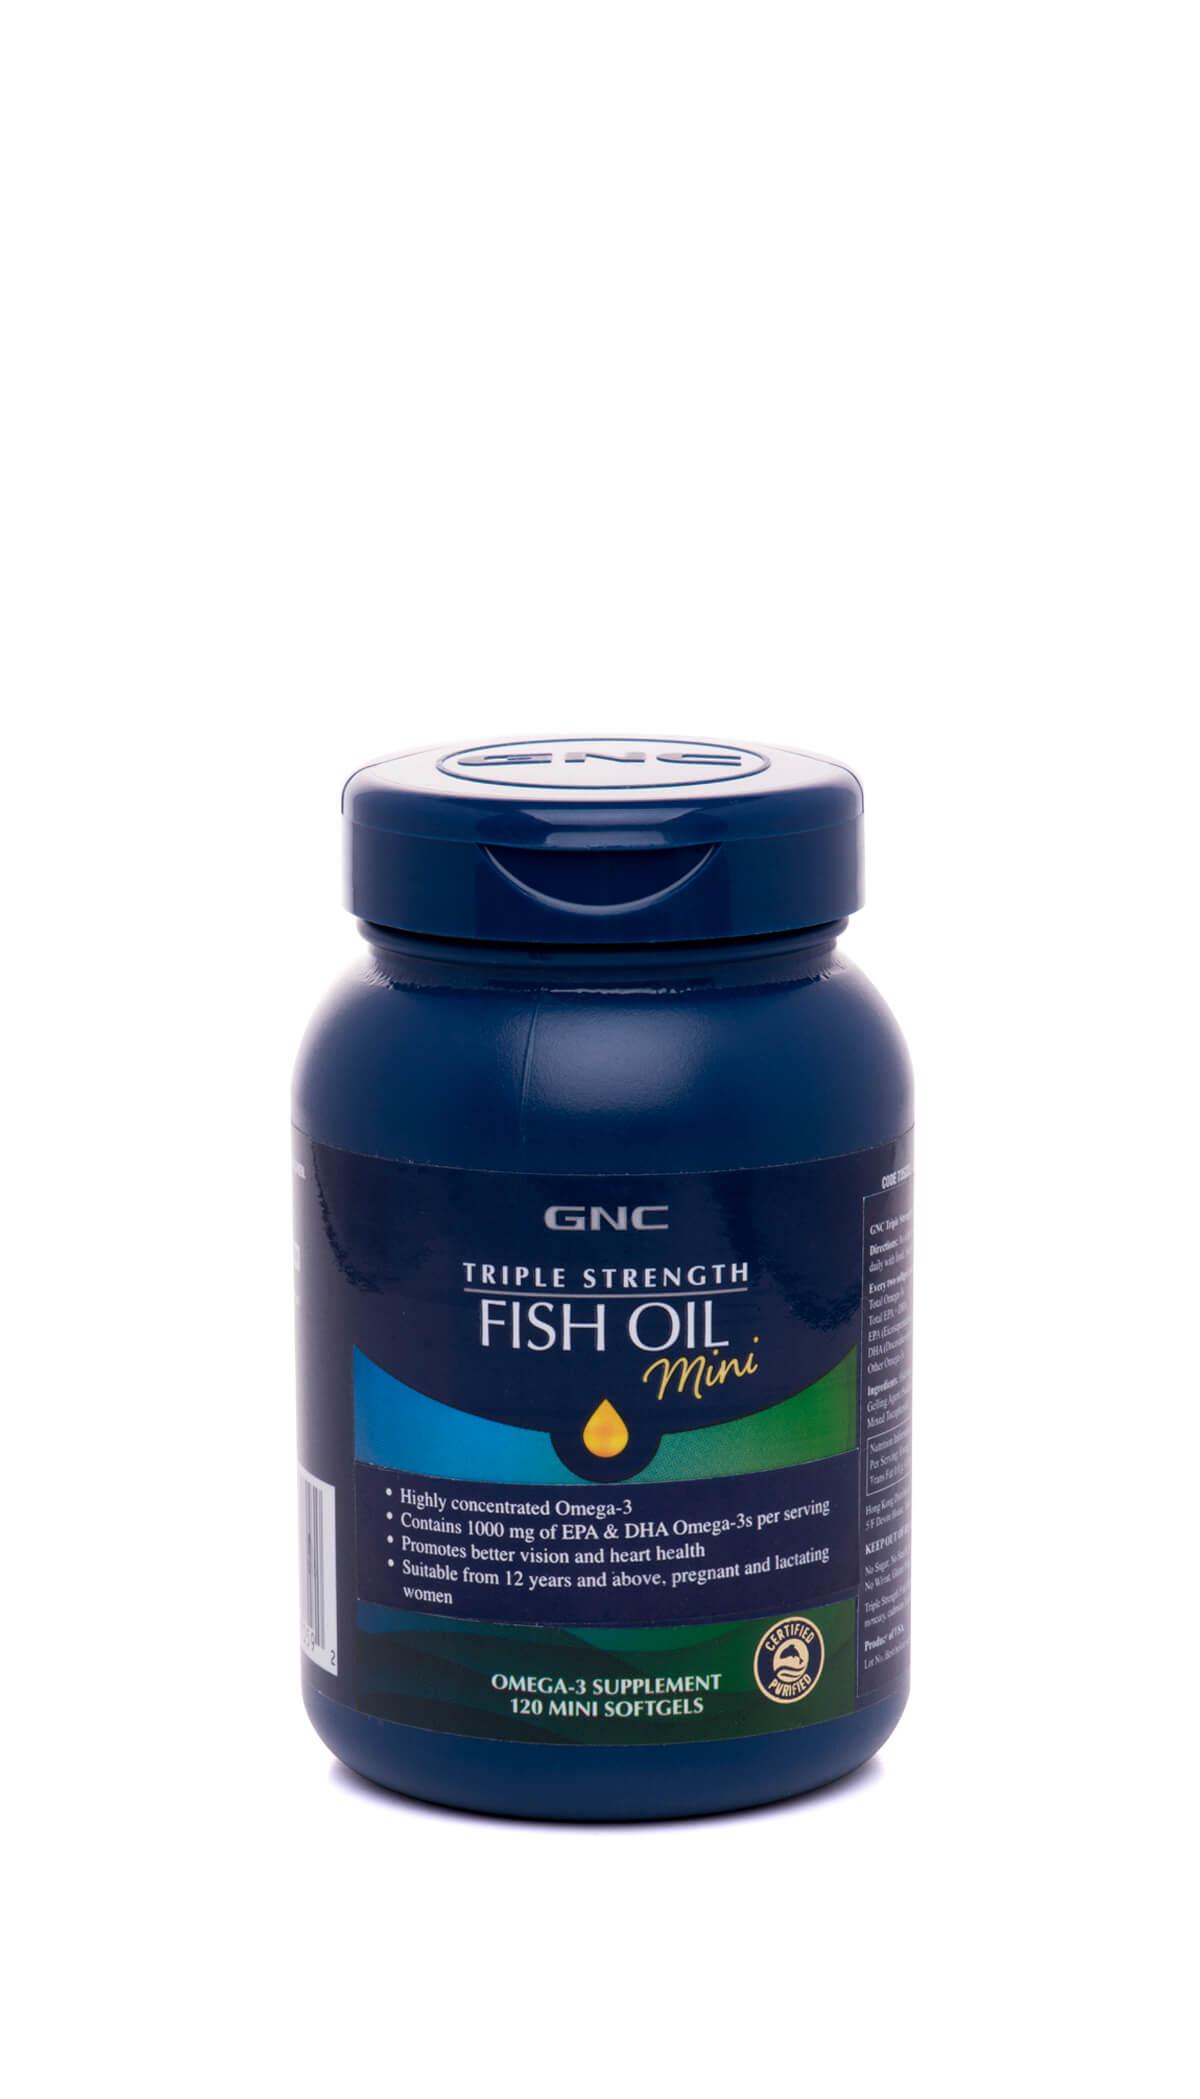 Triple Strength Fish Oil (120 Mini Softgels)